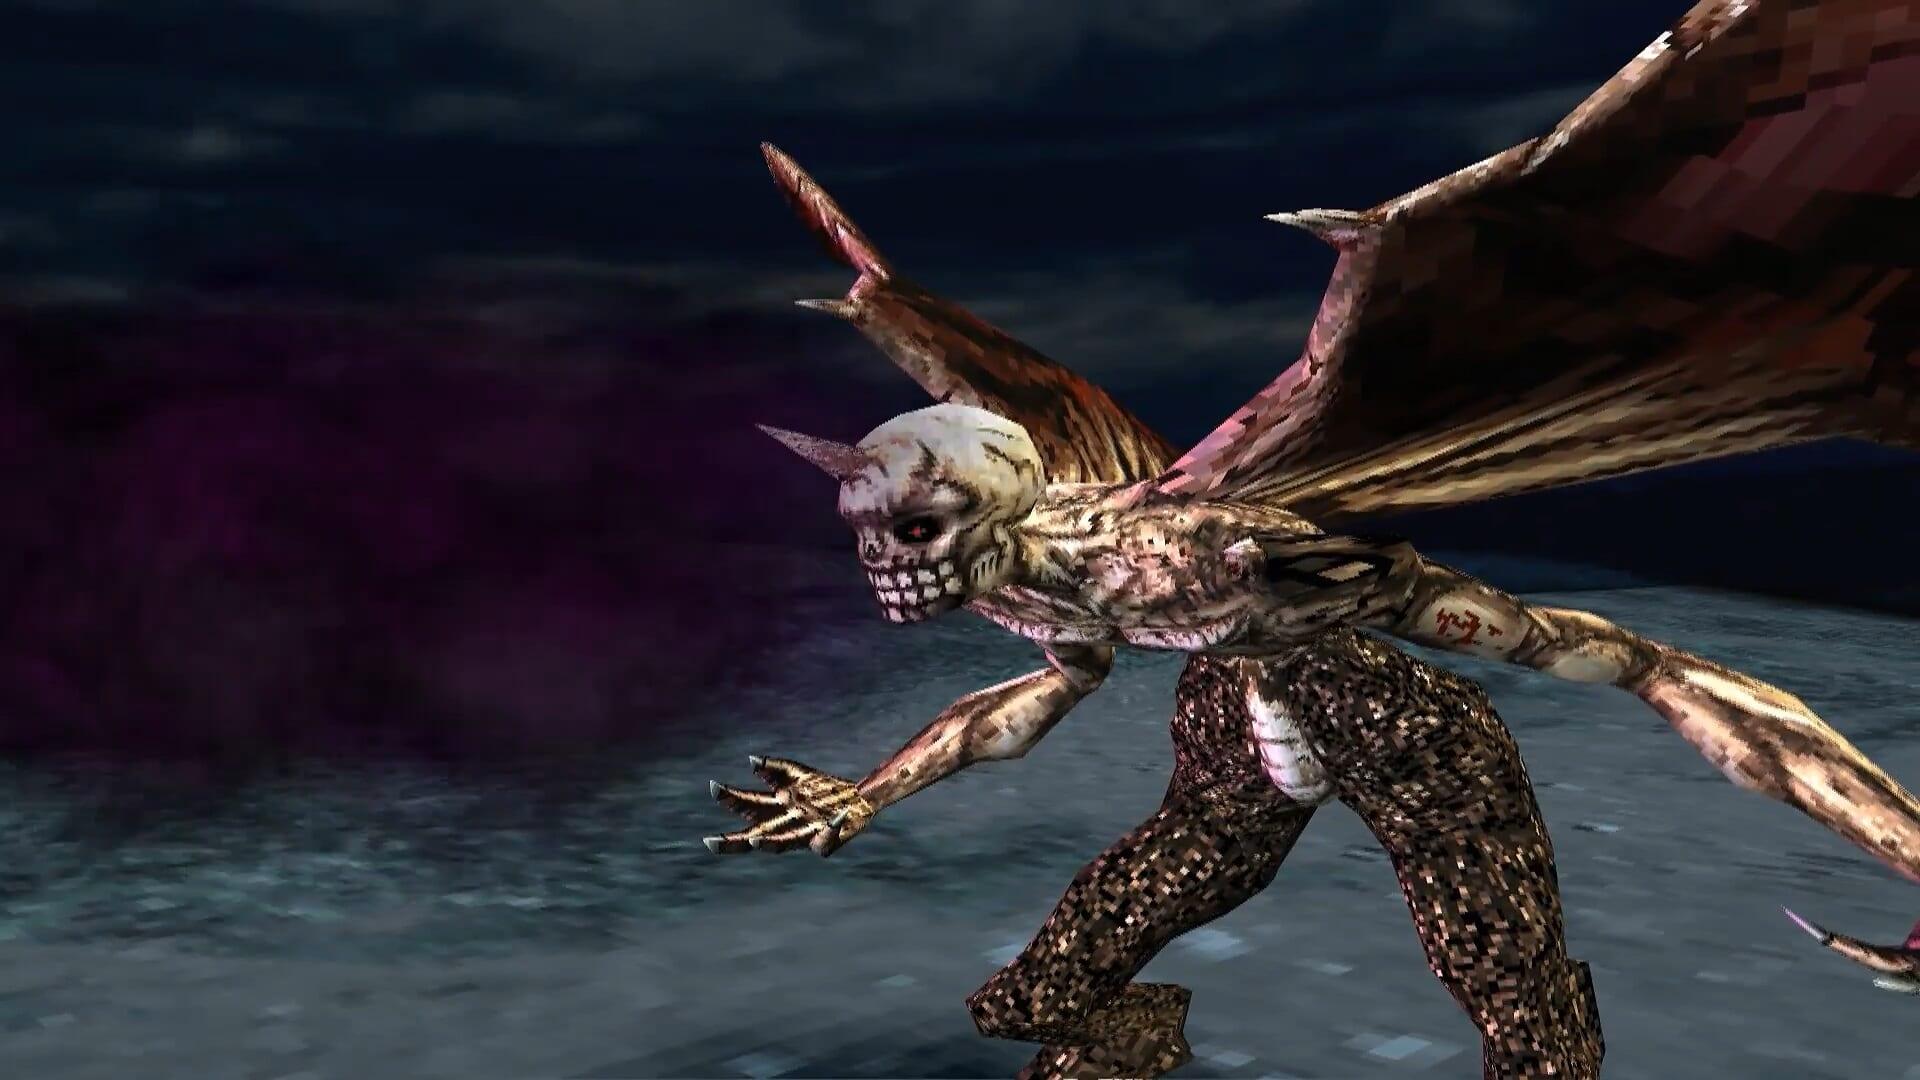 shadow hearts - skeletal demon breathing poison gas